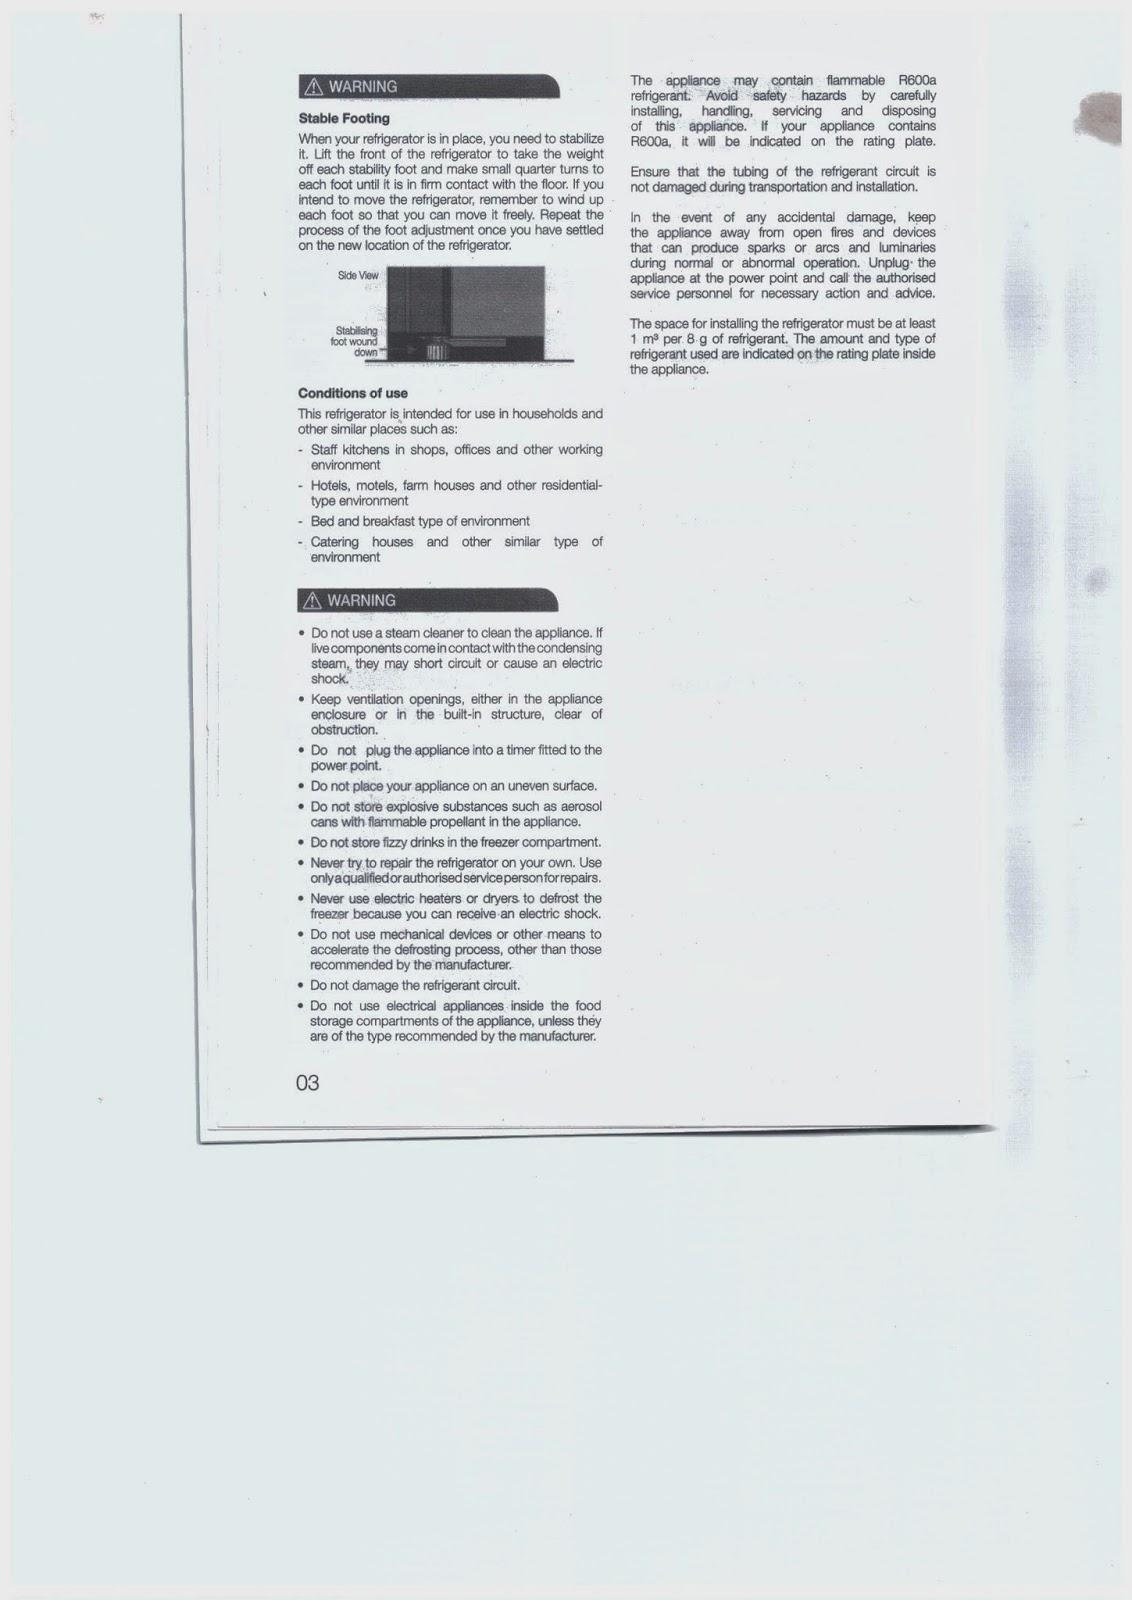 Tesa height 400 user manual ebook array electrolux inspire manual ebook rh electrolux inspire manual ebook tempower us array electrolux service manual ebook coupon codes fandeluxe Gallery